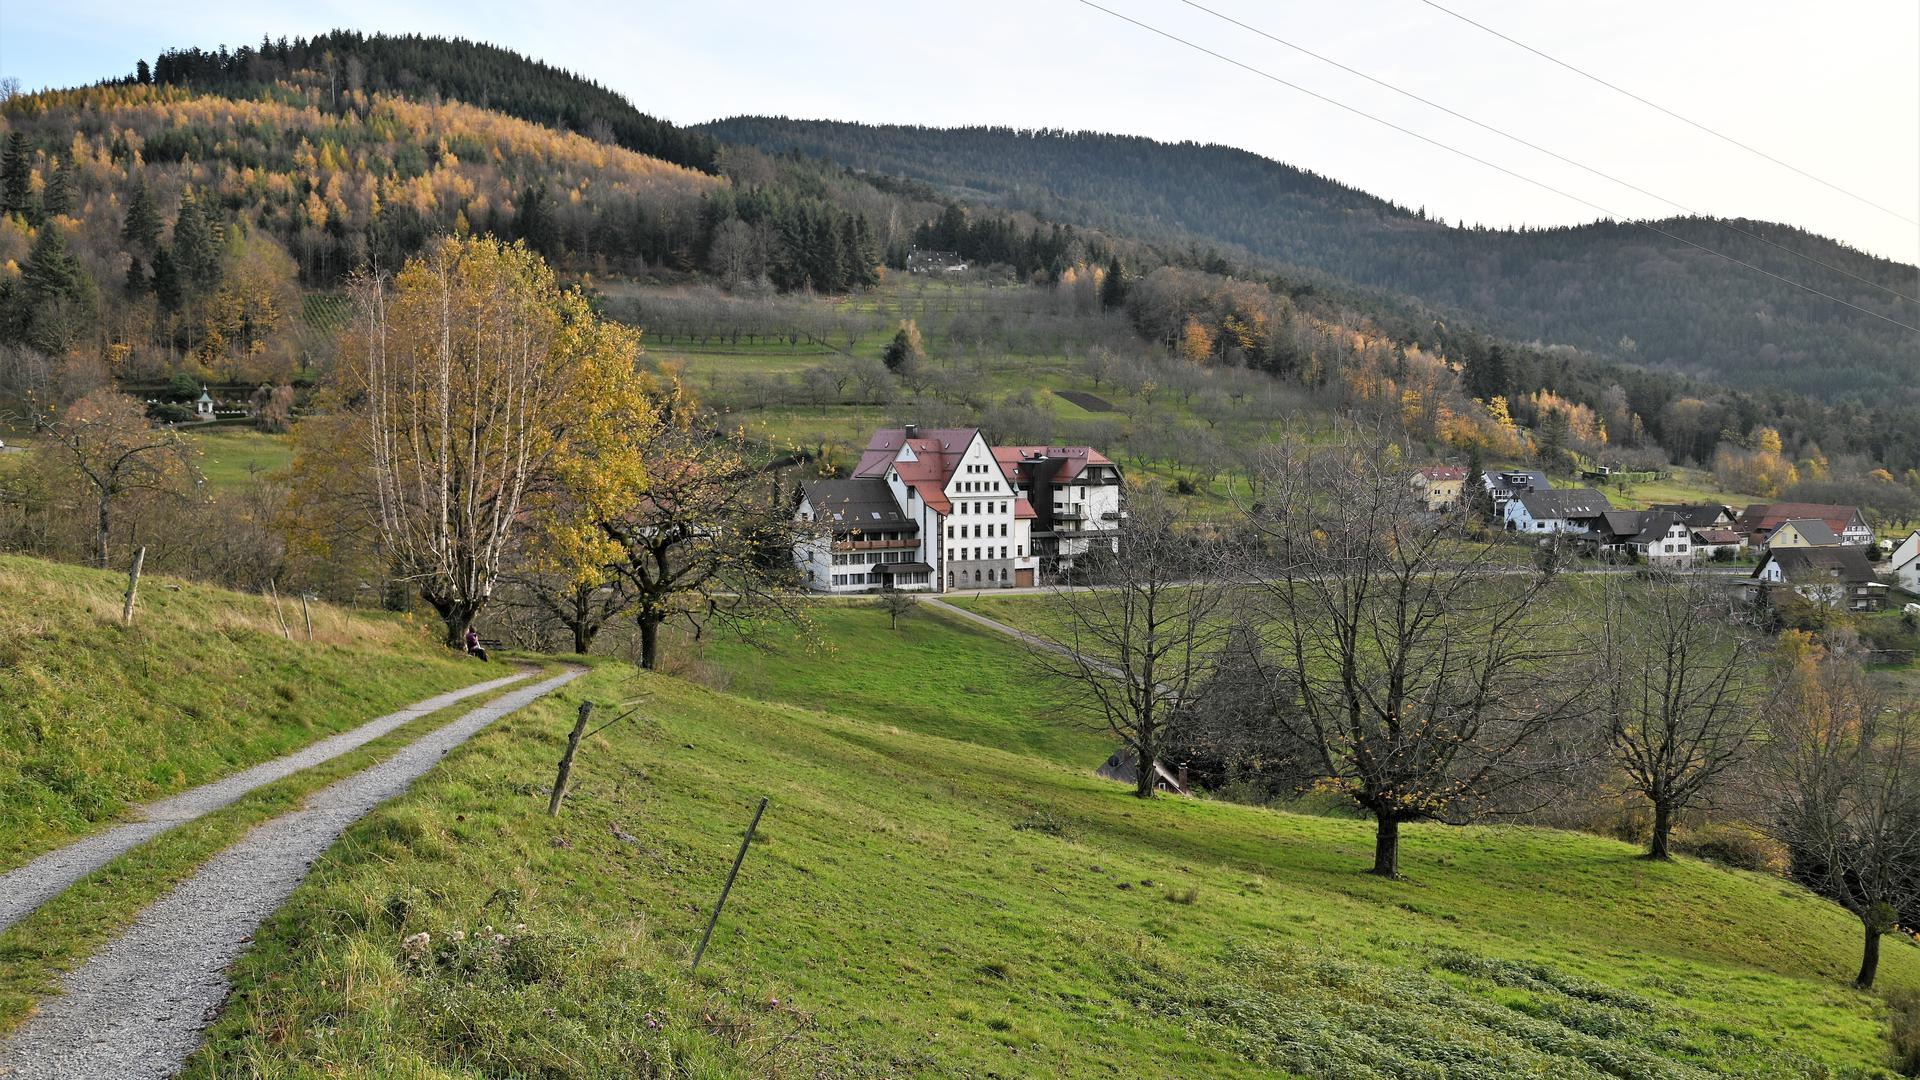 Mutterhaus Neusatzeck